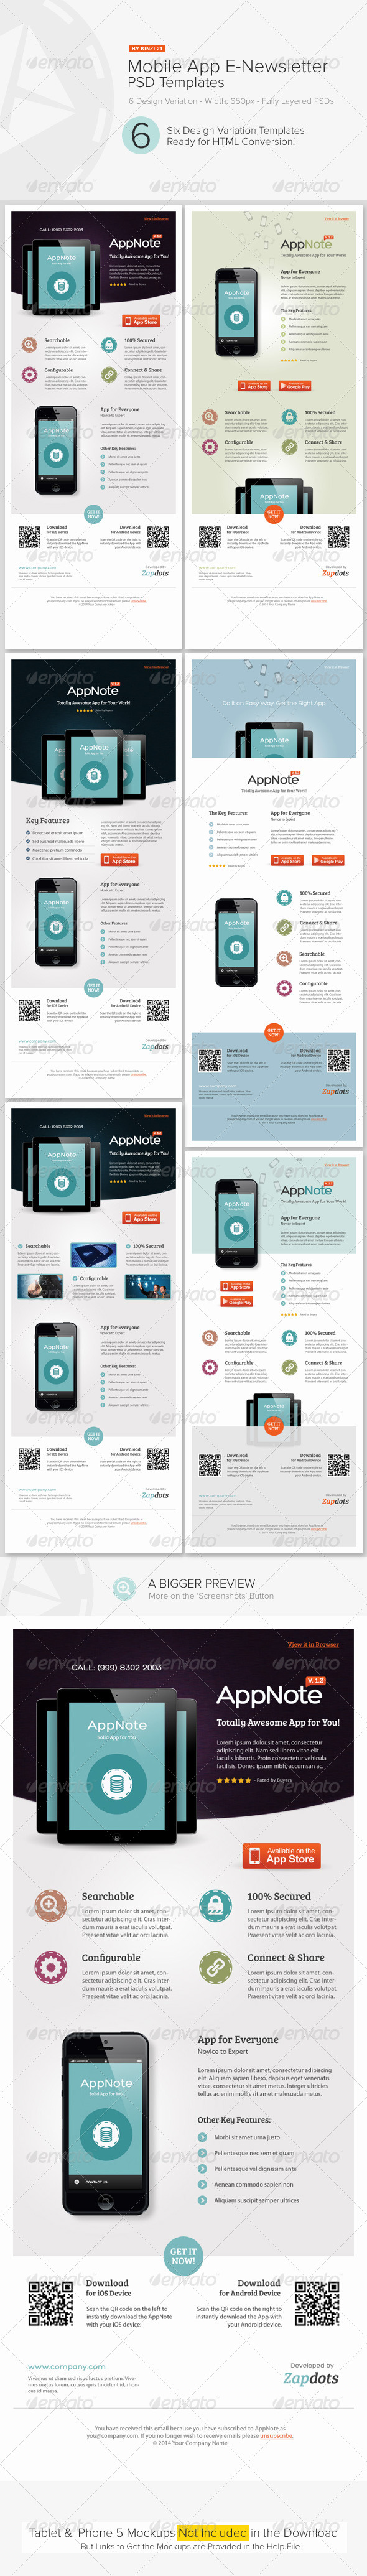 Mobile App E-Newsletter PSD Templates - E-newsletters Web Elements